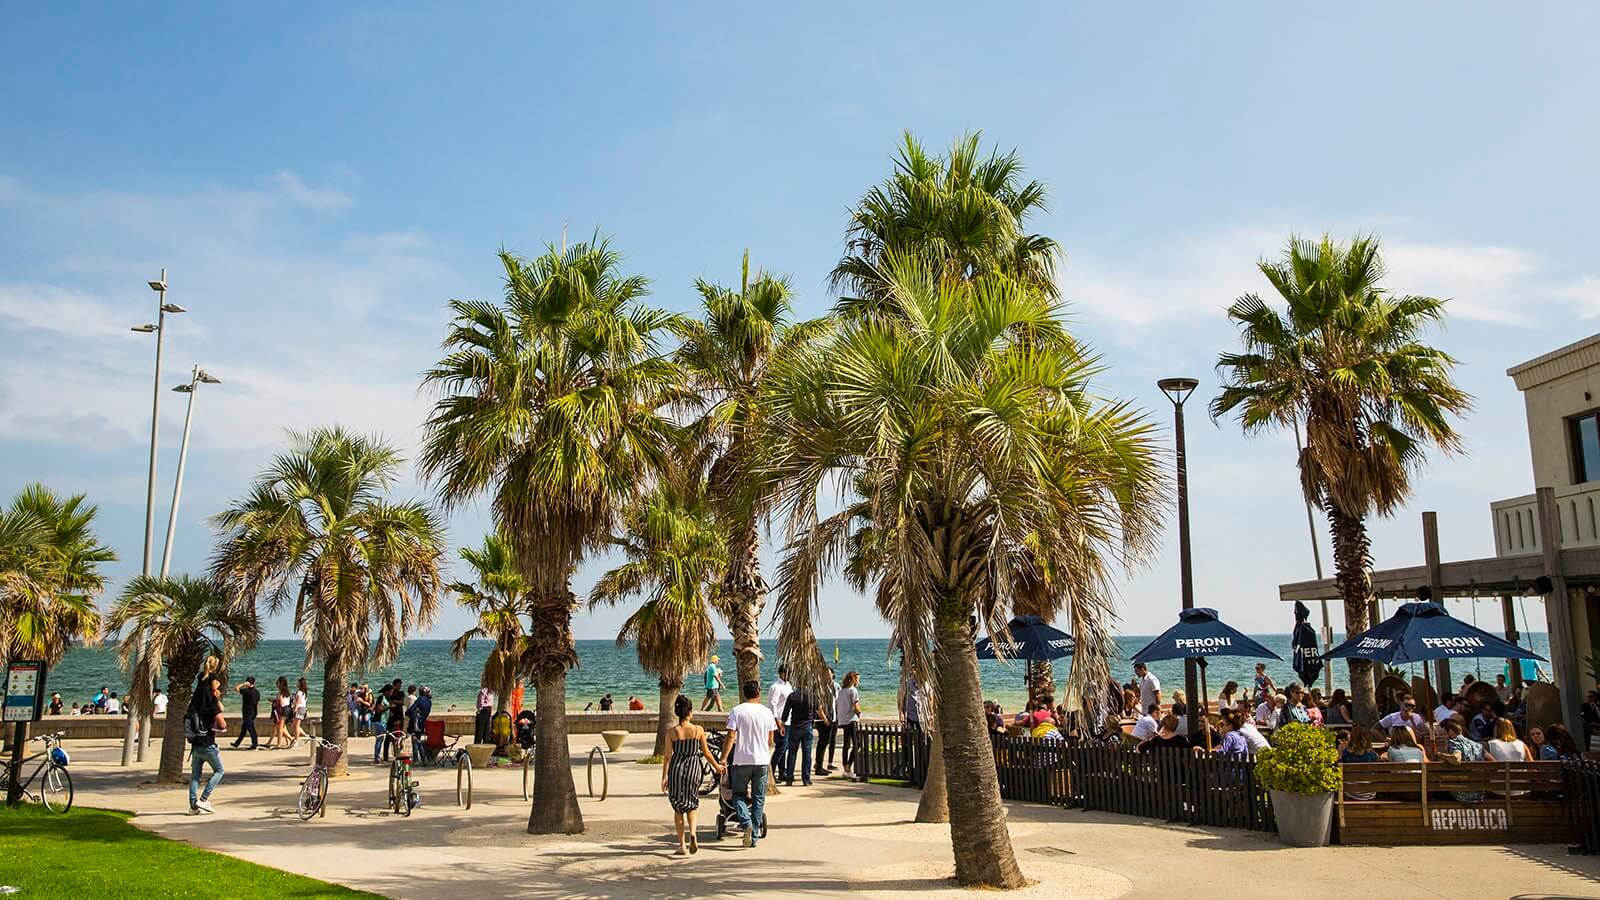 st-kilda-beach_mel_r_132611_1600x900